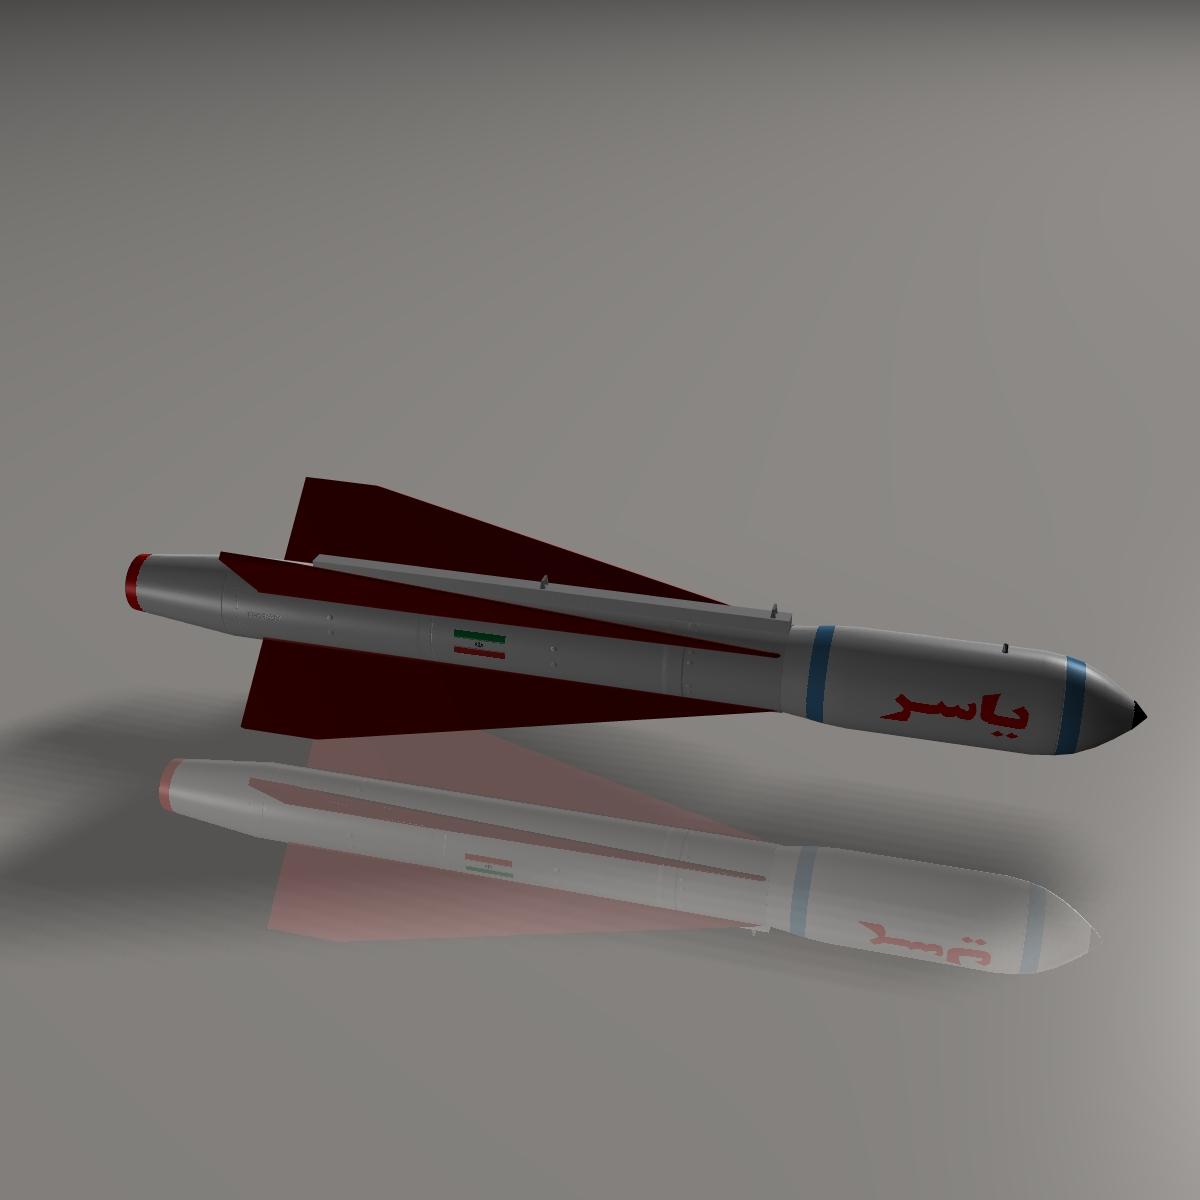 iran yasser asm raketi 3d modeli 3ds dxf cob x obj 150570